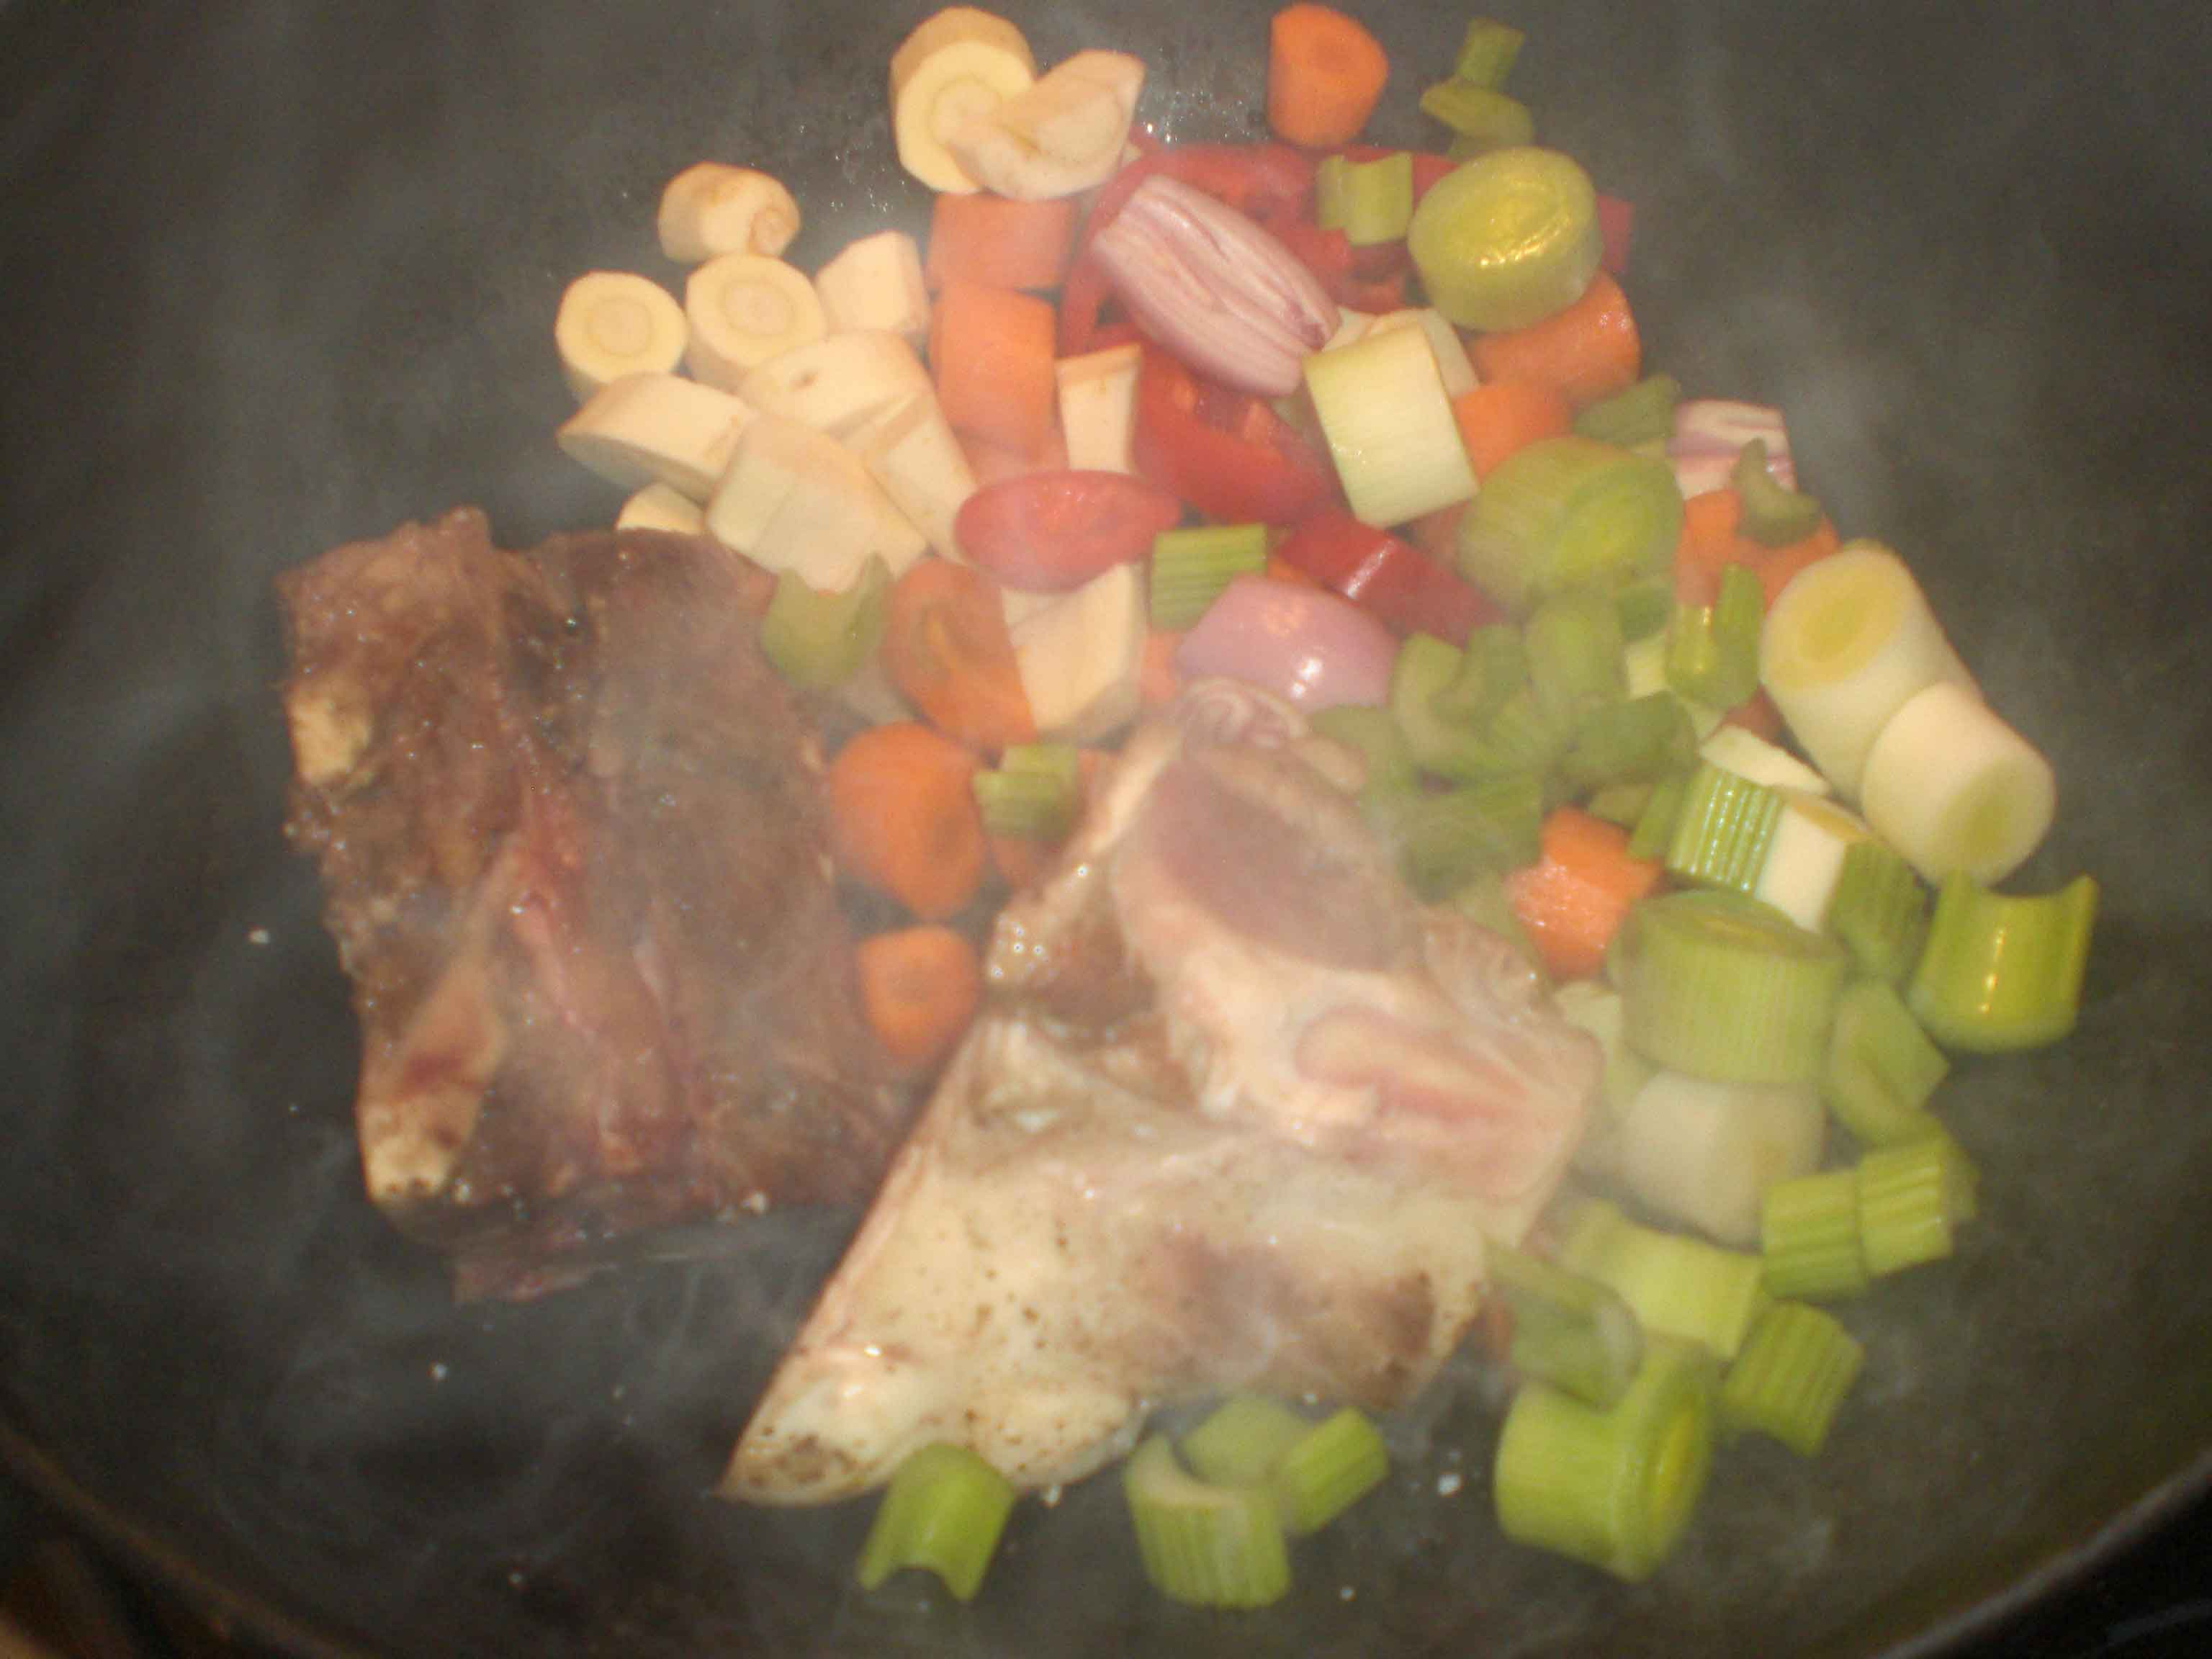 Tilsæt grøntsager, og svits.